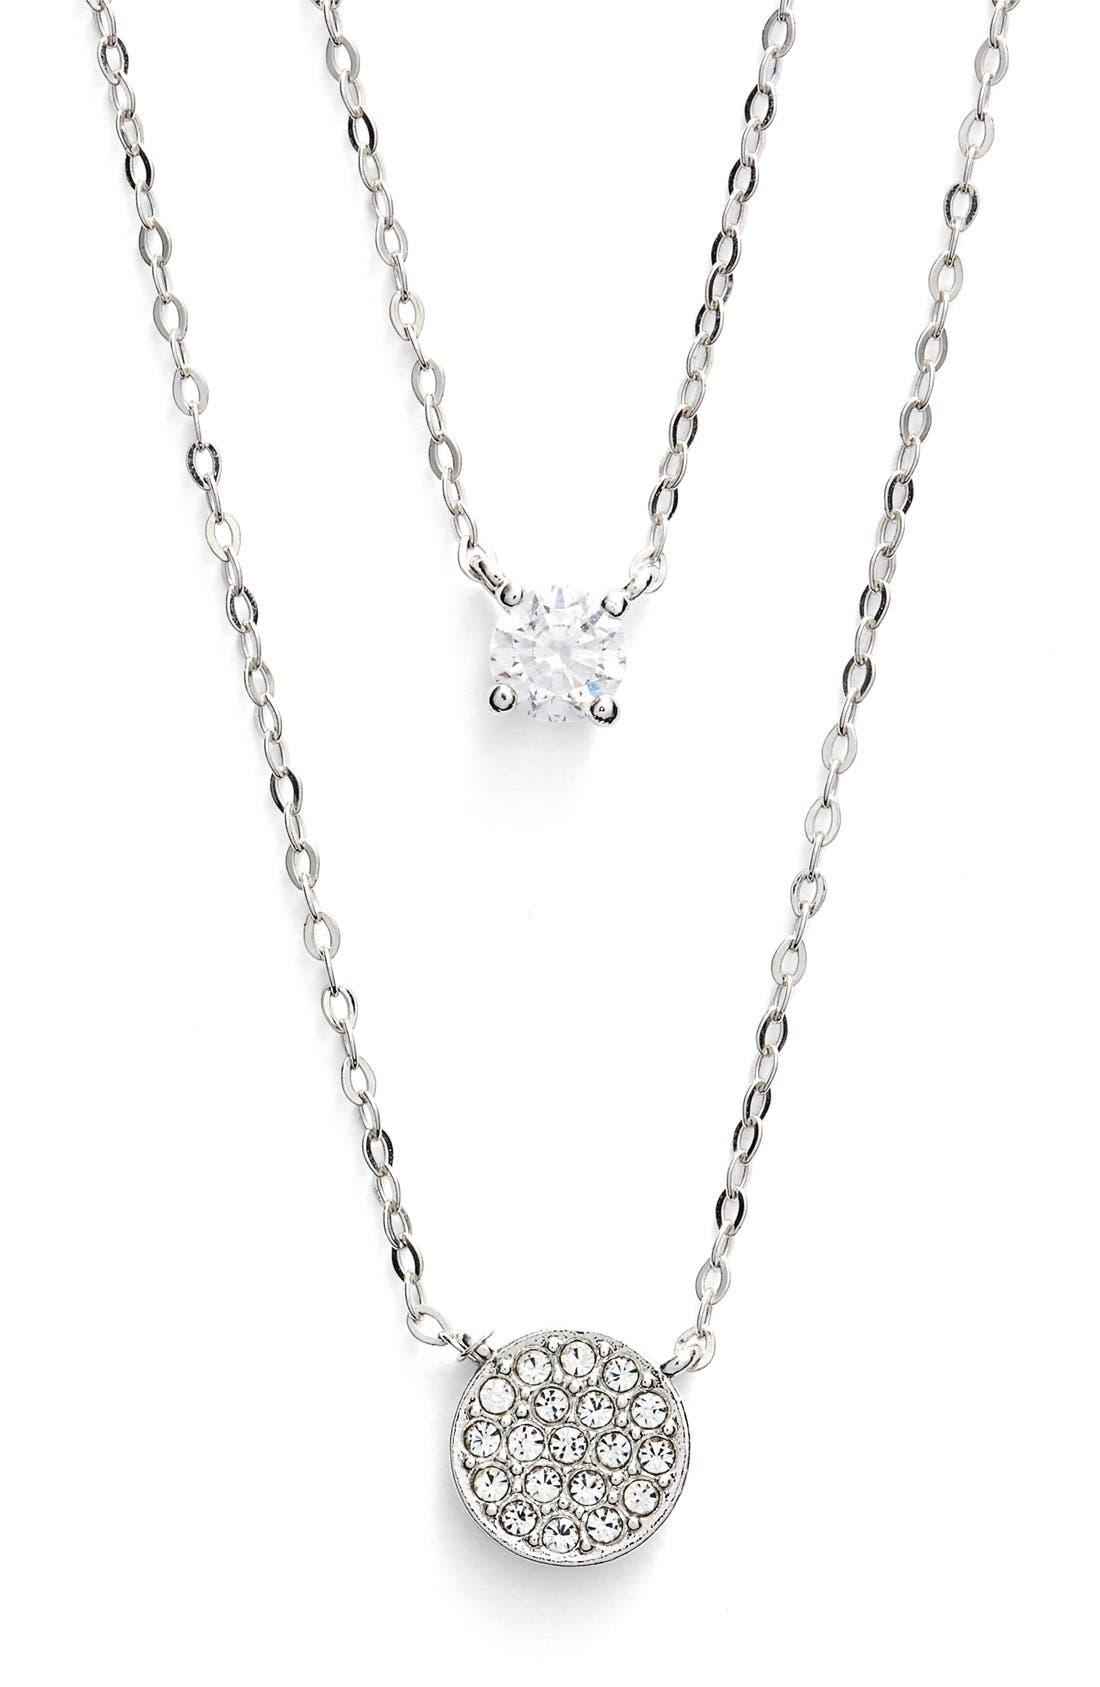 Main Image - Nadri Double Pendant Necklace